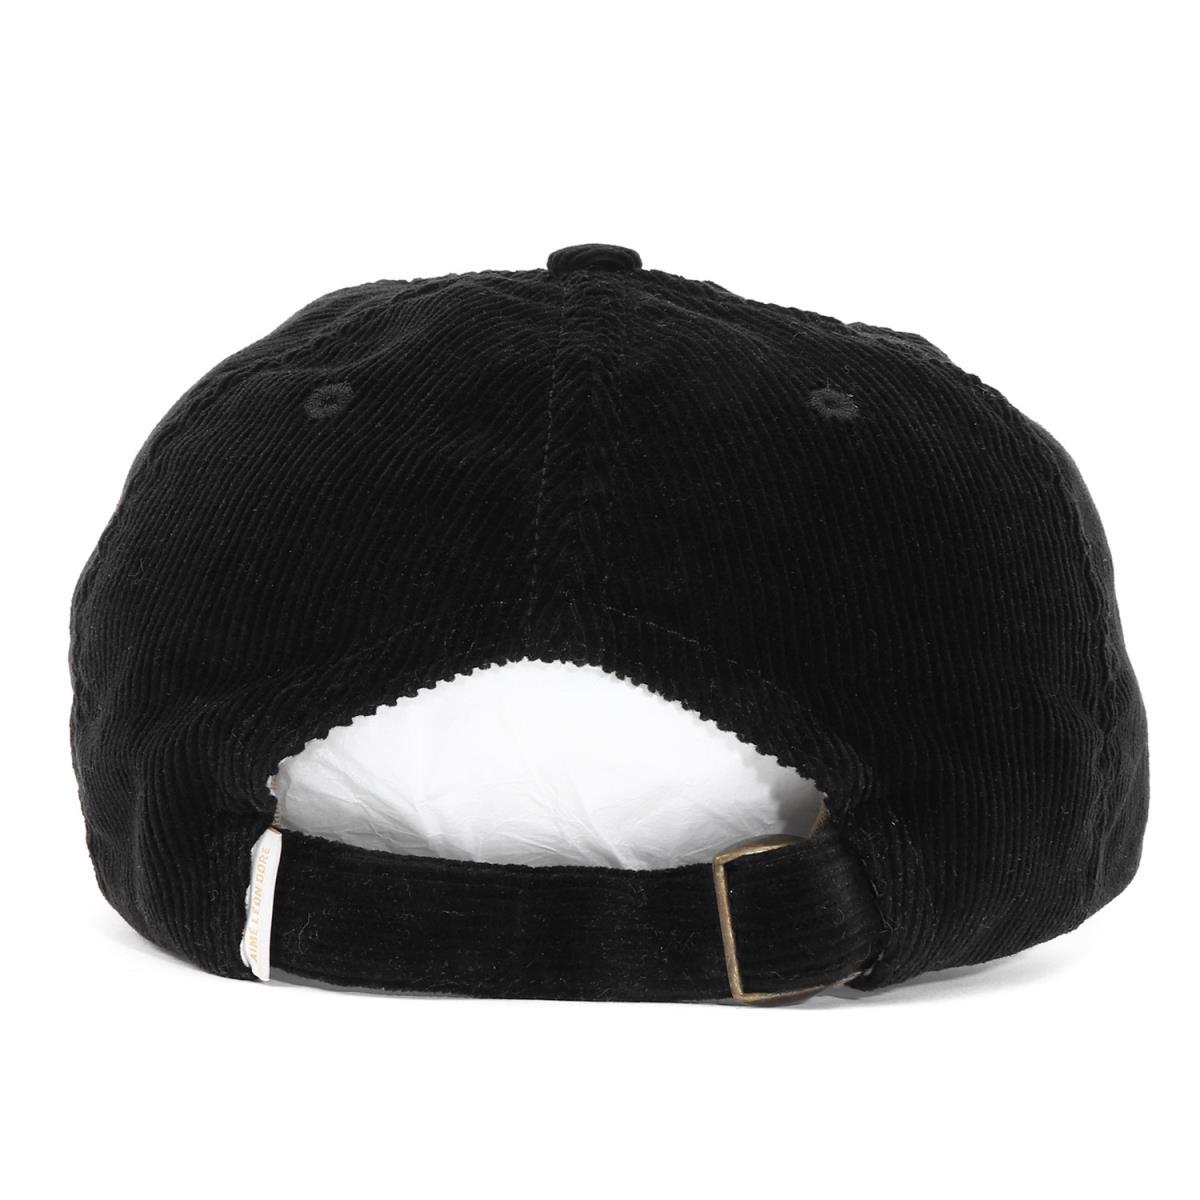 2be95f2629876 AIME LEON DORE (エイメレオンドレ) Aime logo embroidery corduroy 6 panel cap (ALD  LOGO CAP) black